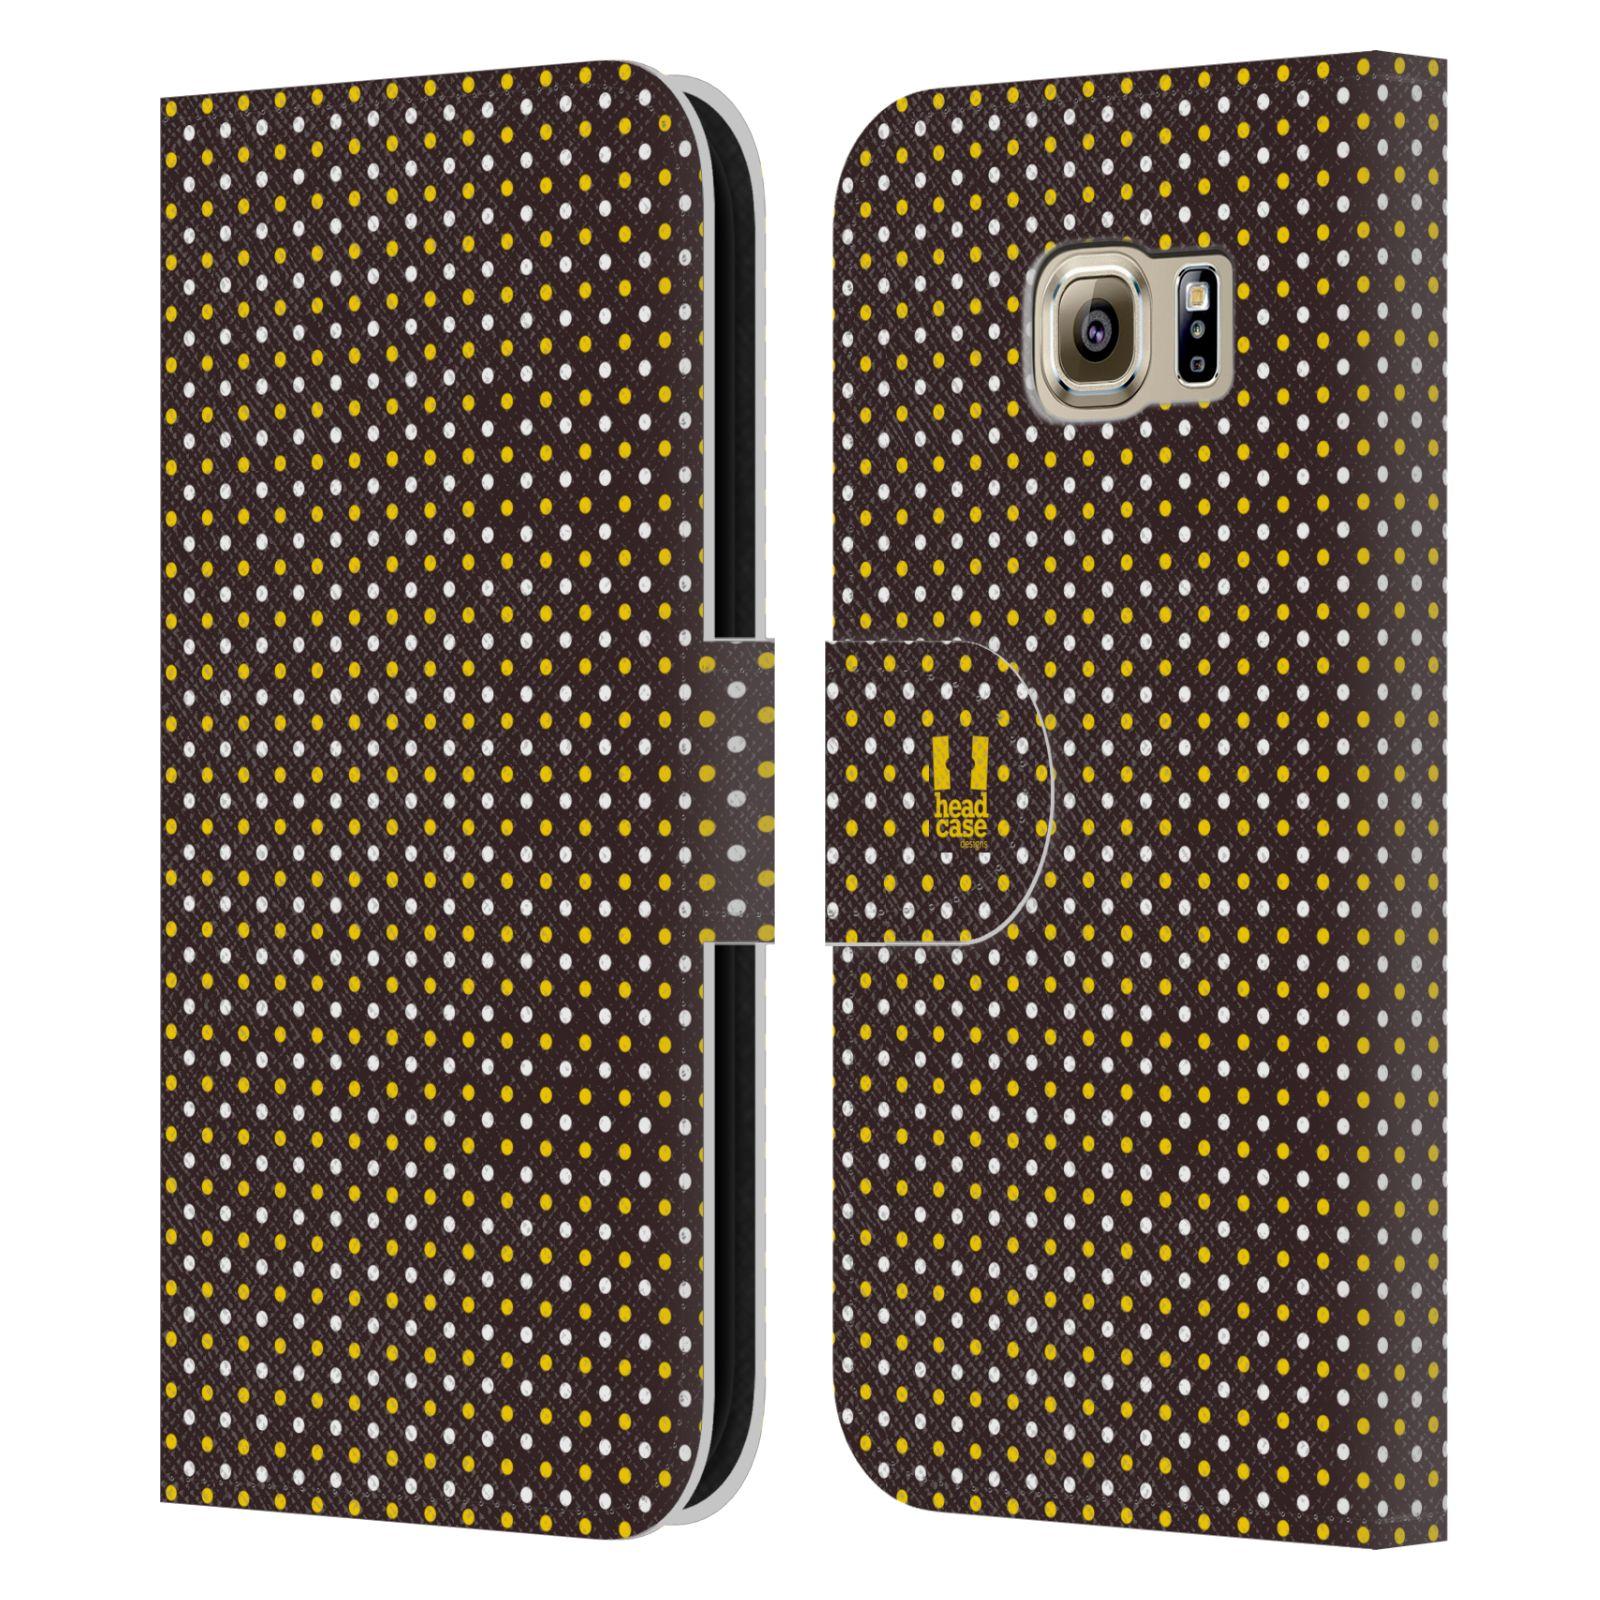 HEAD CASE Flipové pouzdro pro mobil Samsung Galaxy S6 (G9200) VČELÍ VZOR puntíky hnědá a žlutá